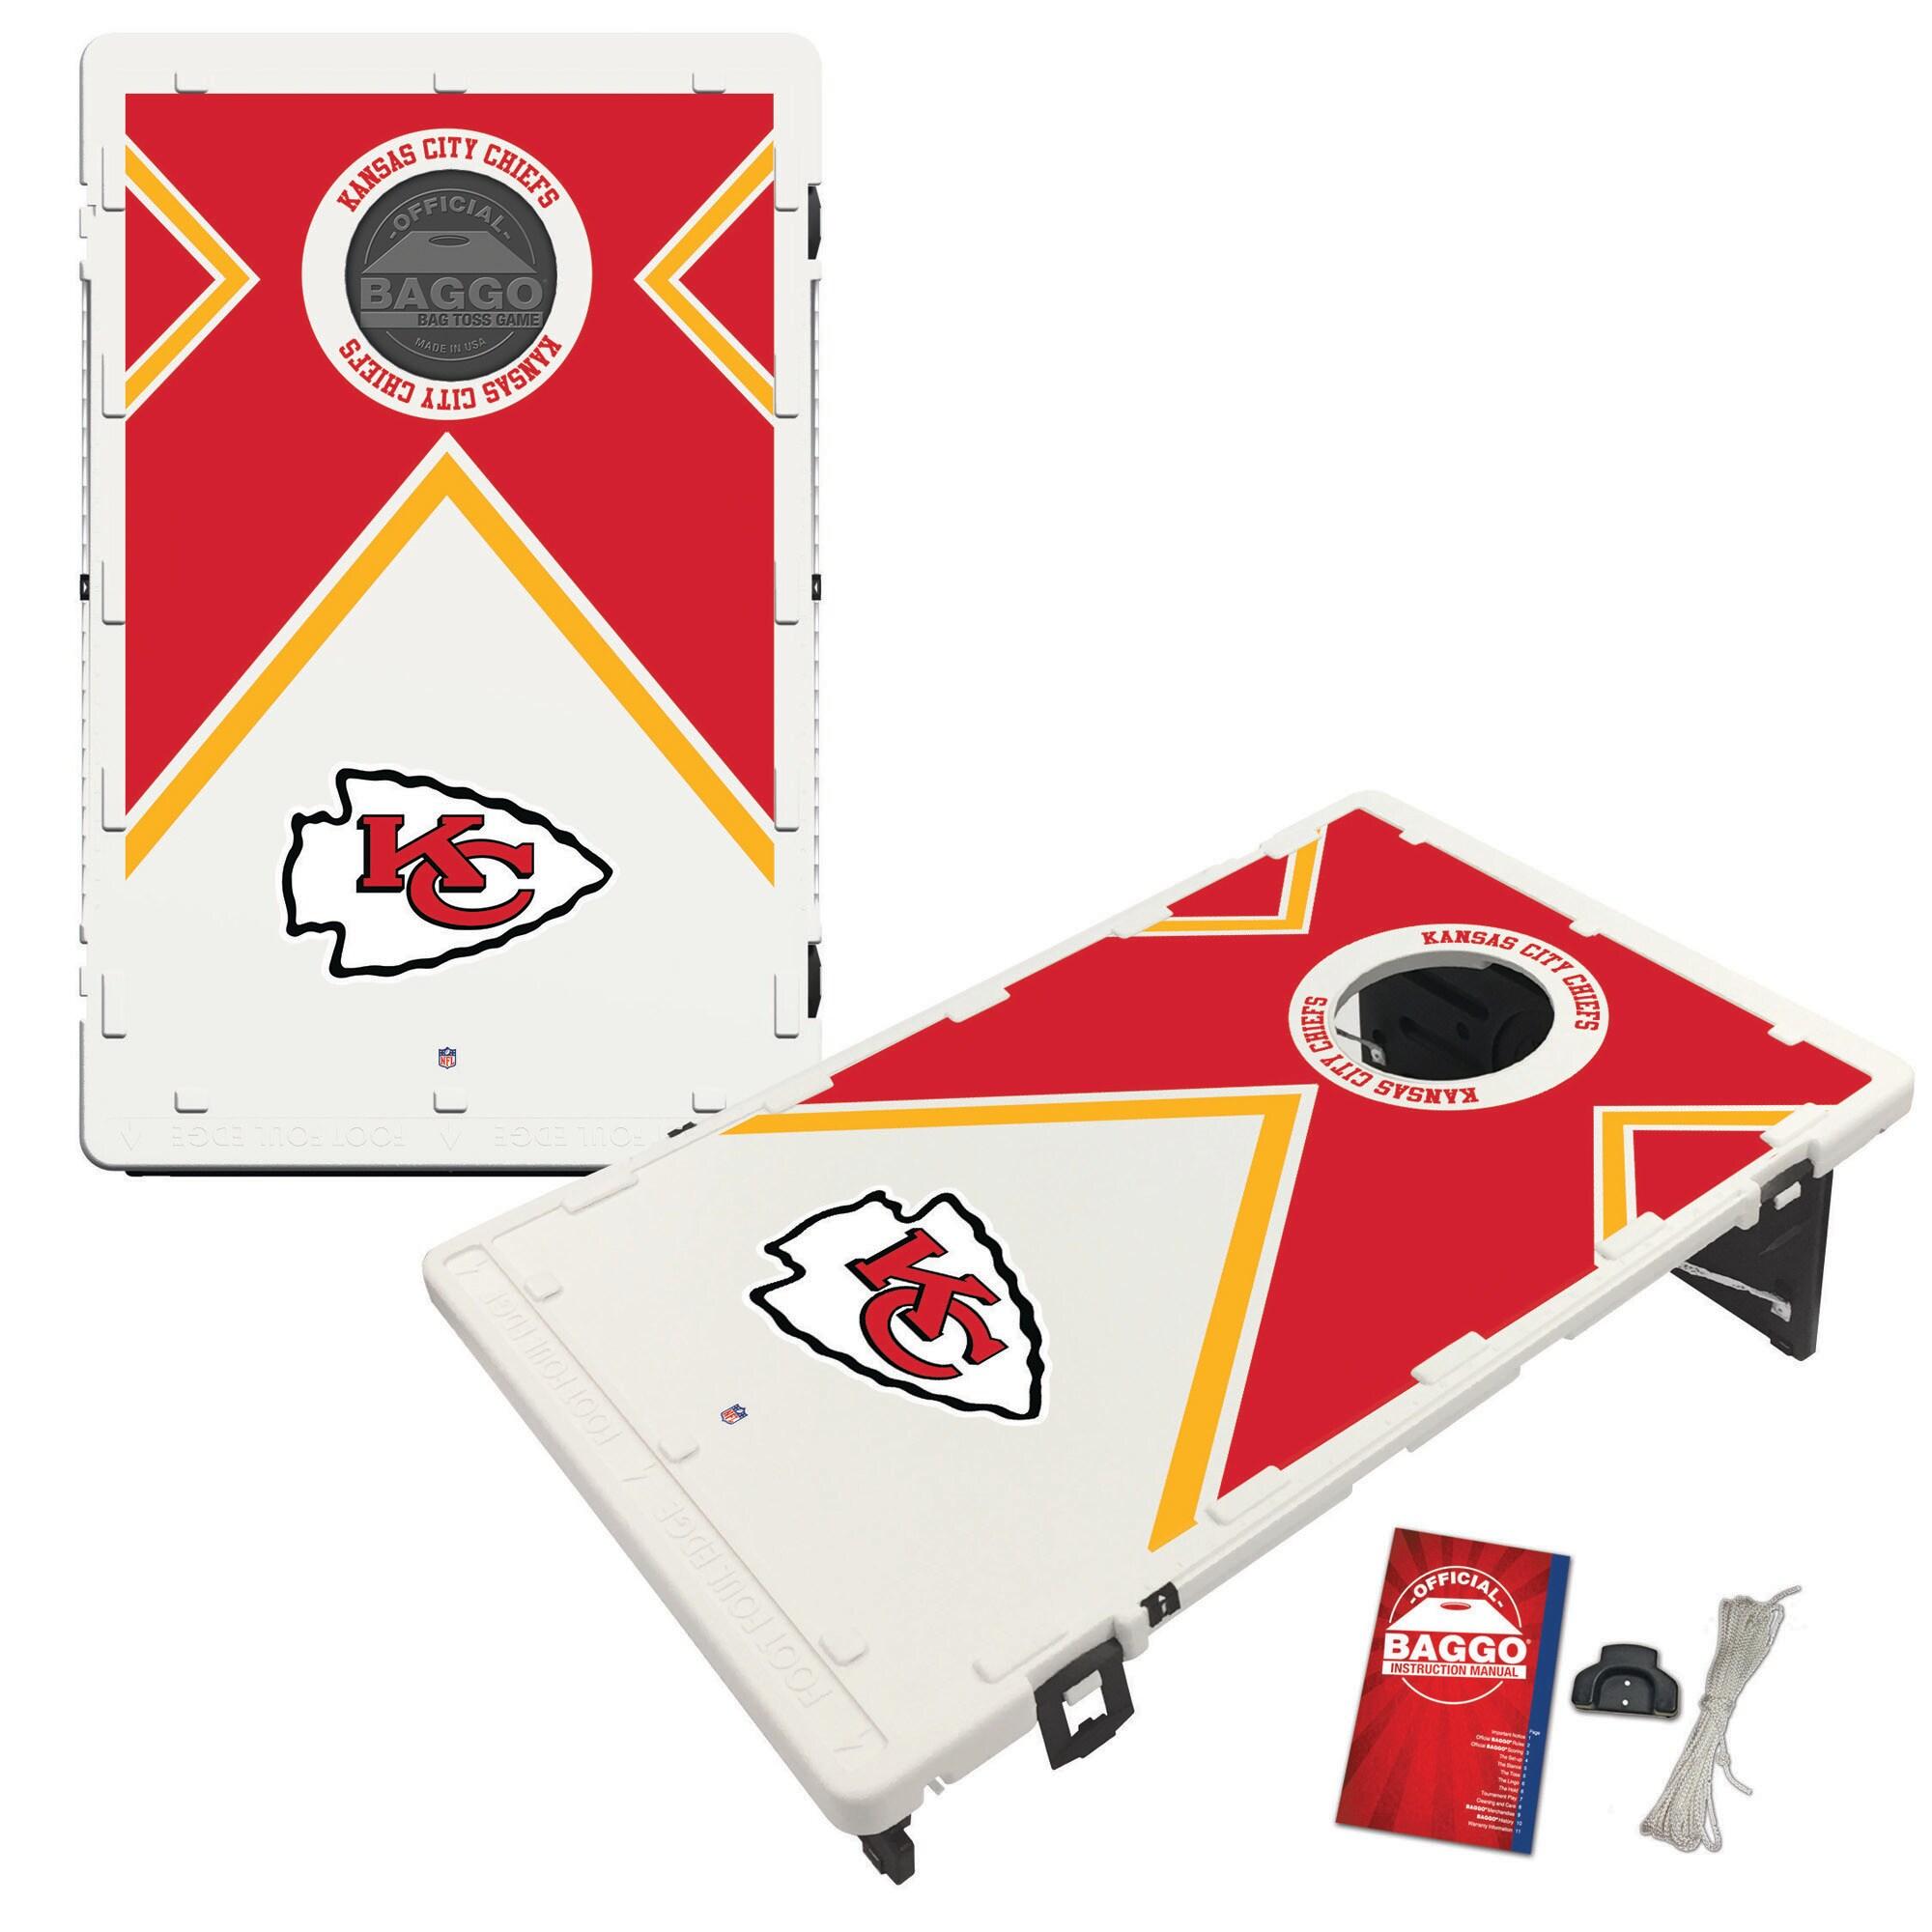 Kansas City Chiefs 2' x 3' BAGGO Vintage Cornhole Board Tailgate Toss Set